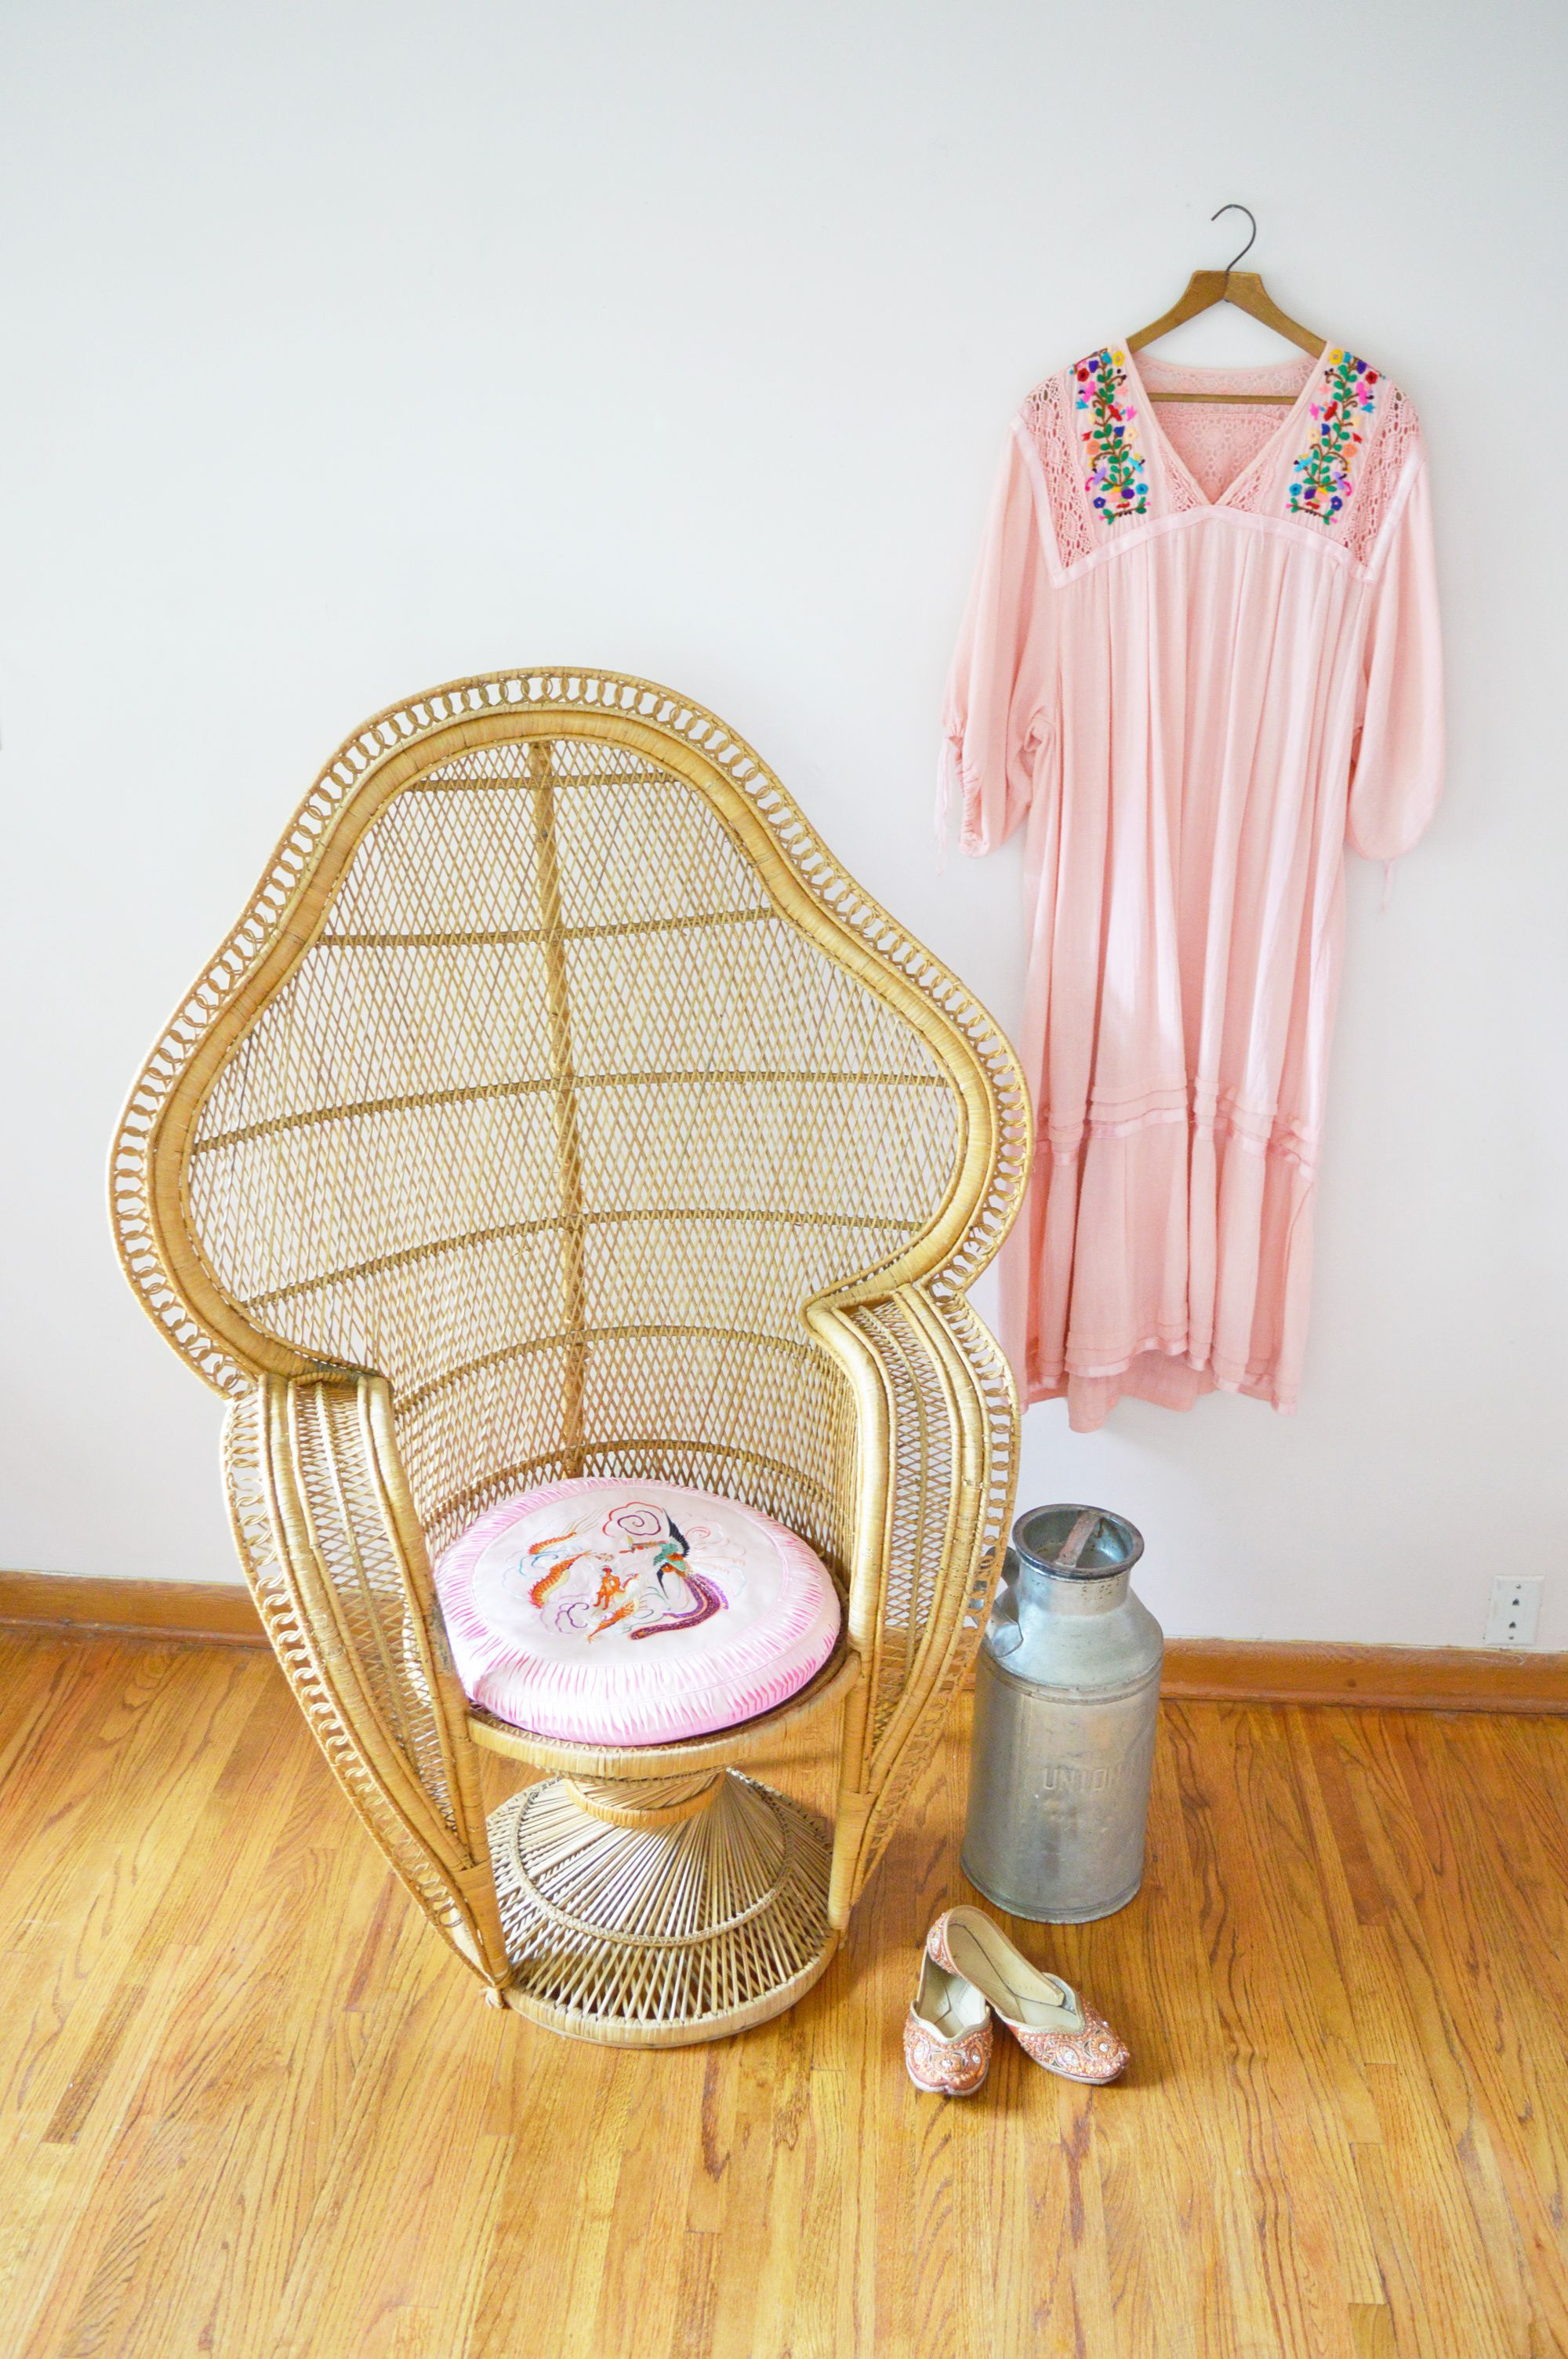 Peacock Chair for Sale in Calgary, AB, Canada by Prairie